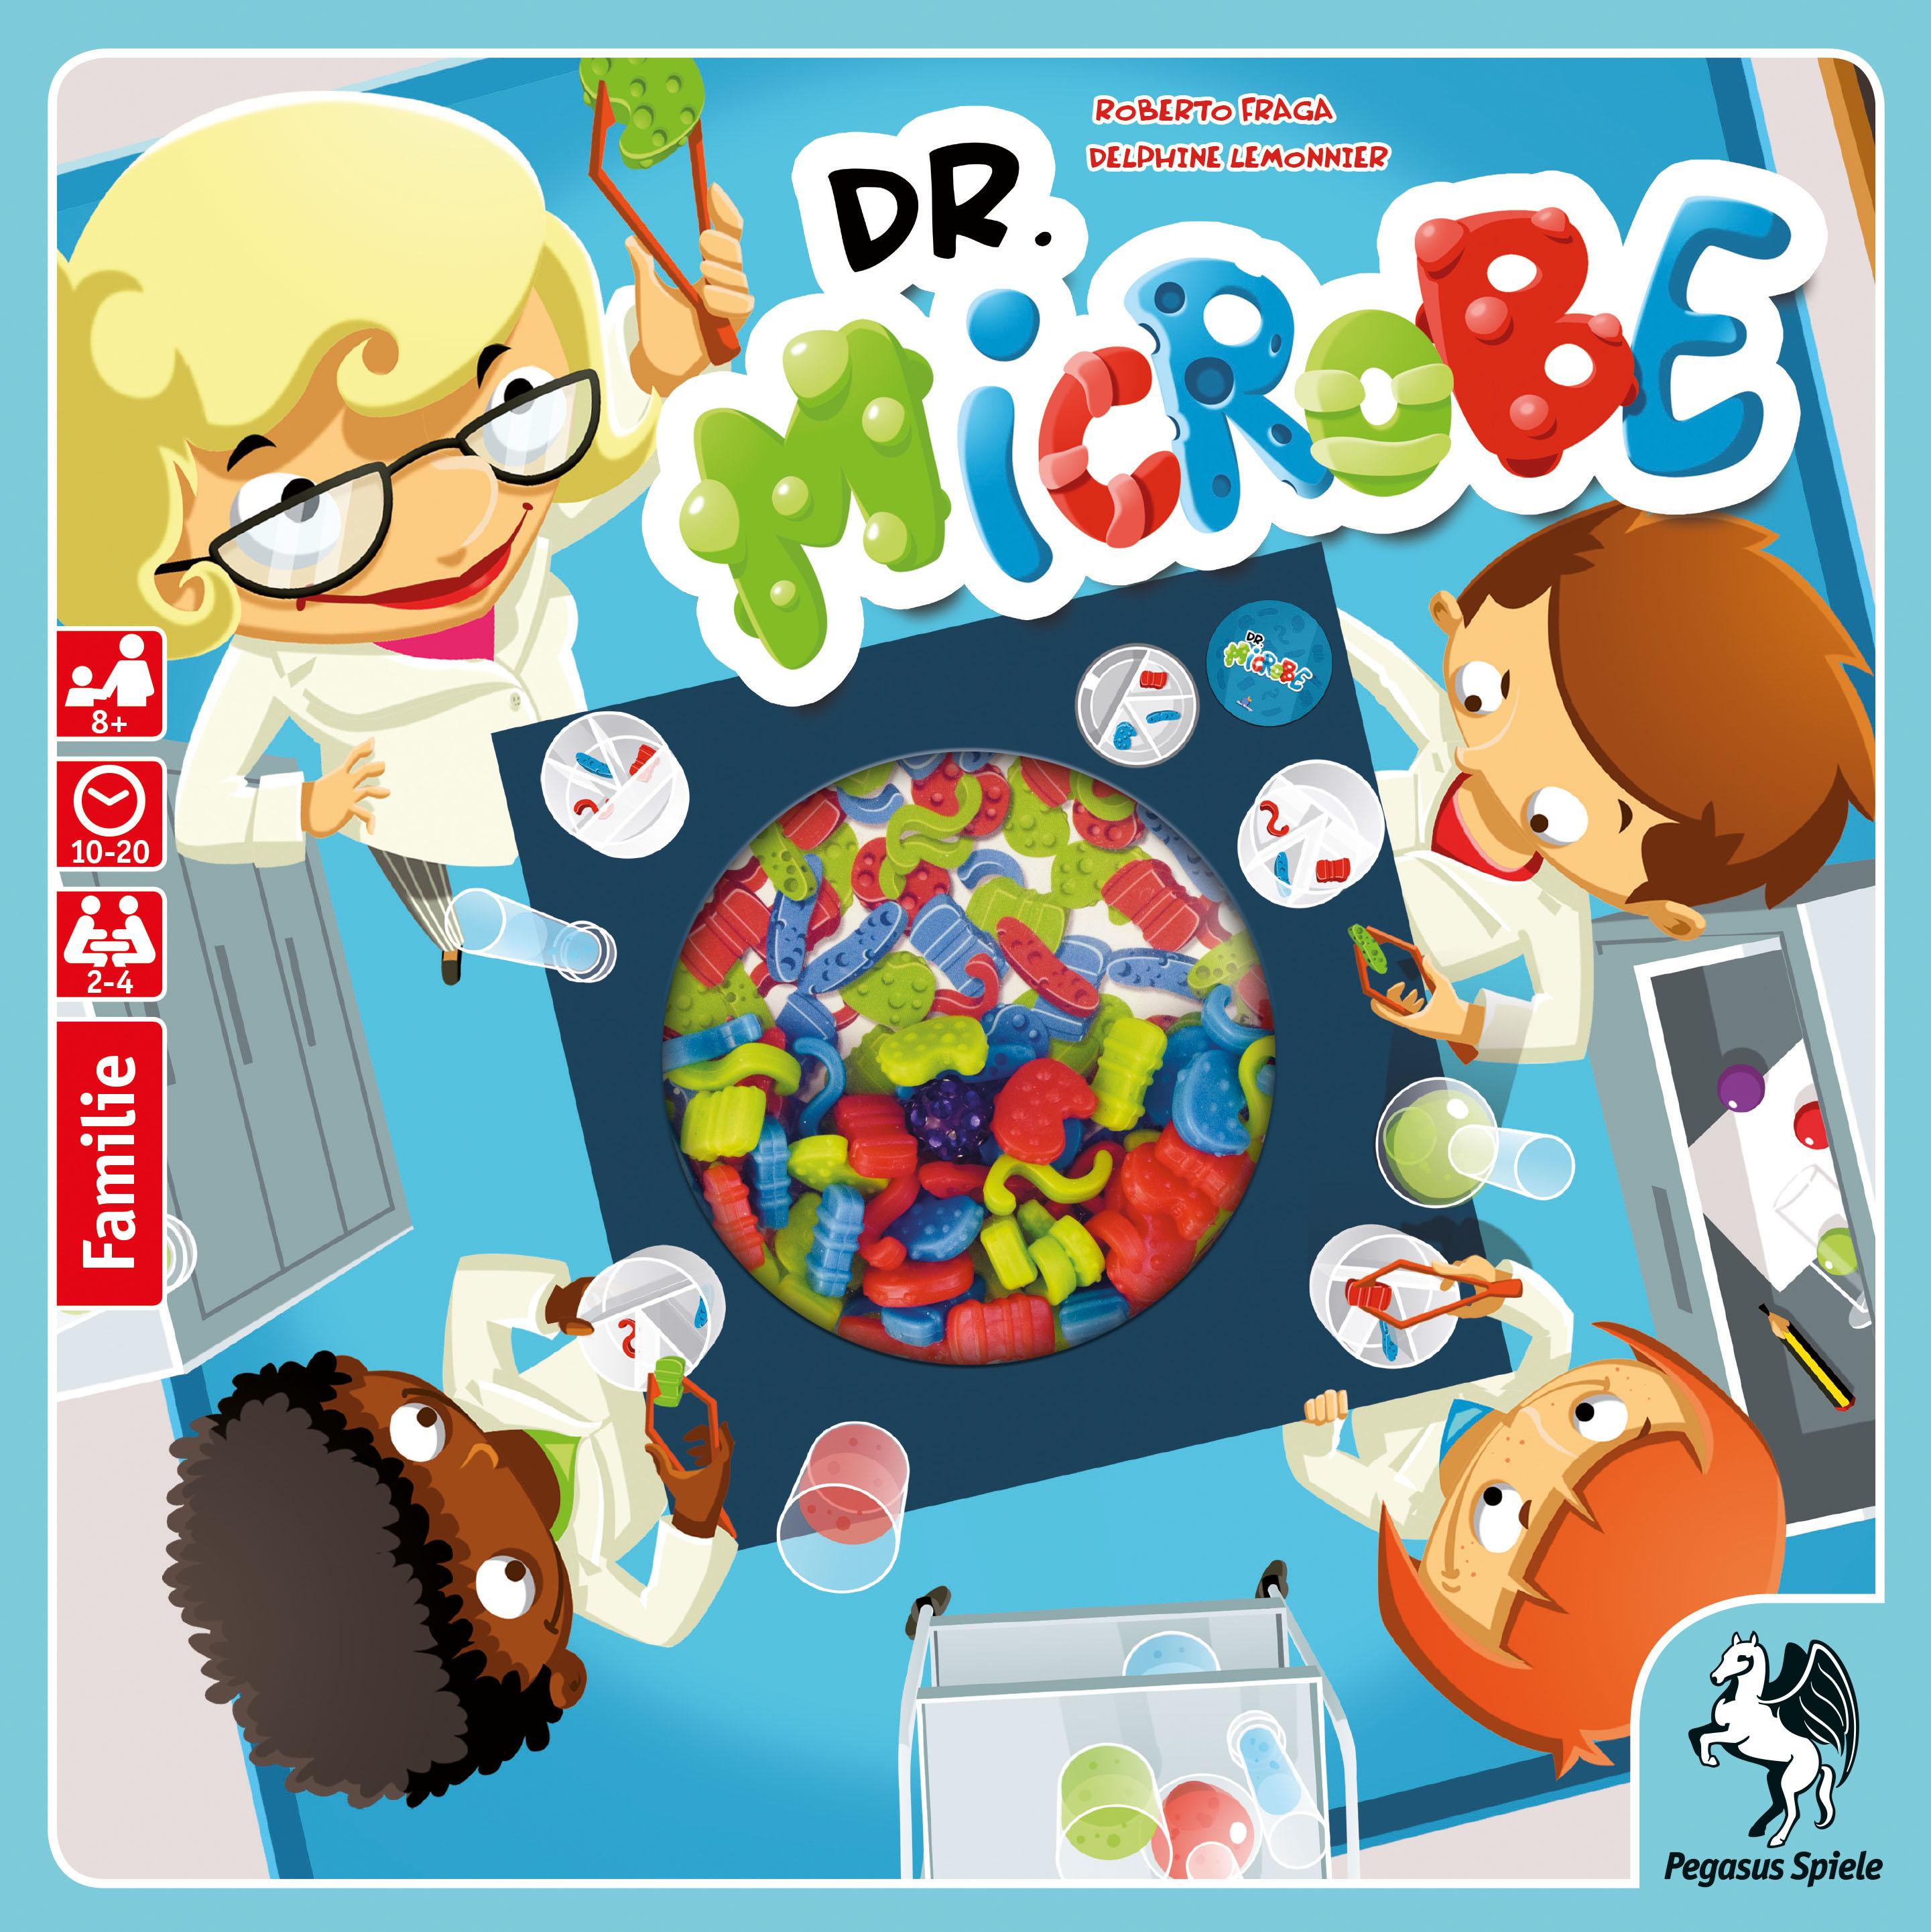 Dr Spiele